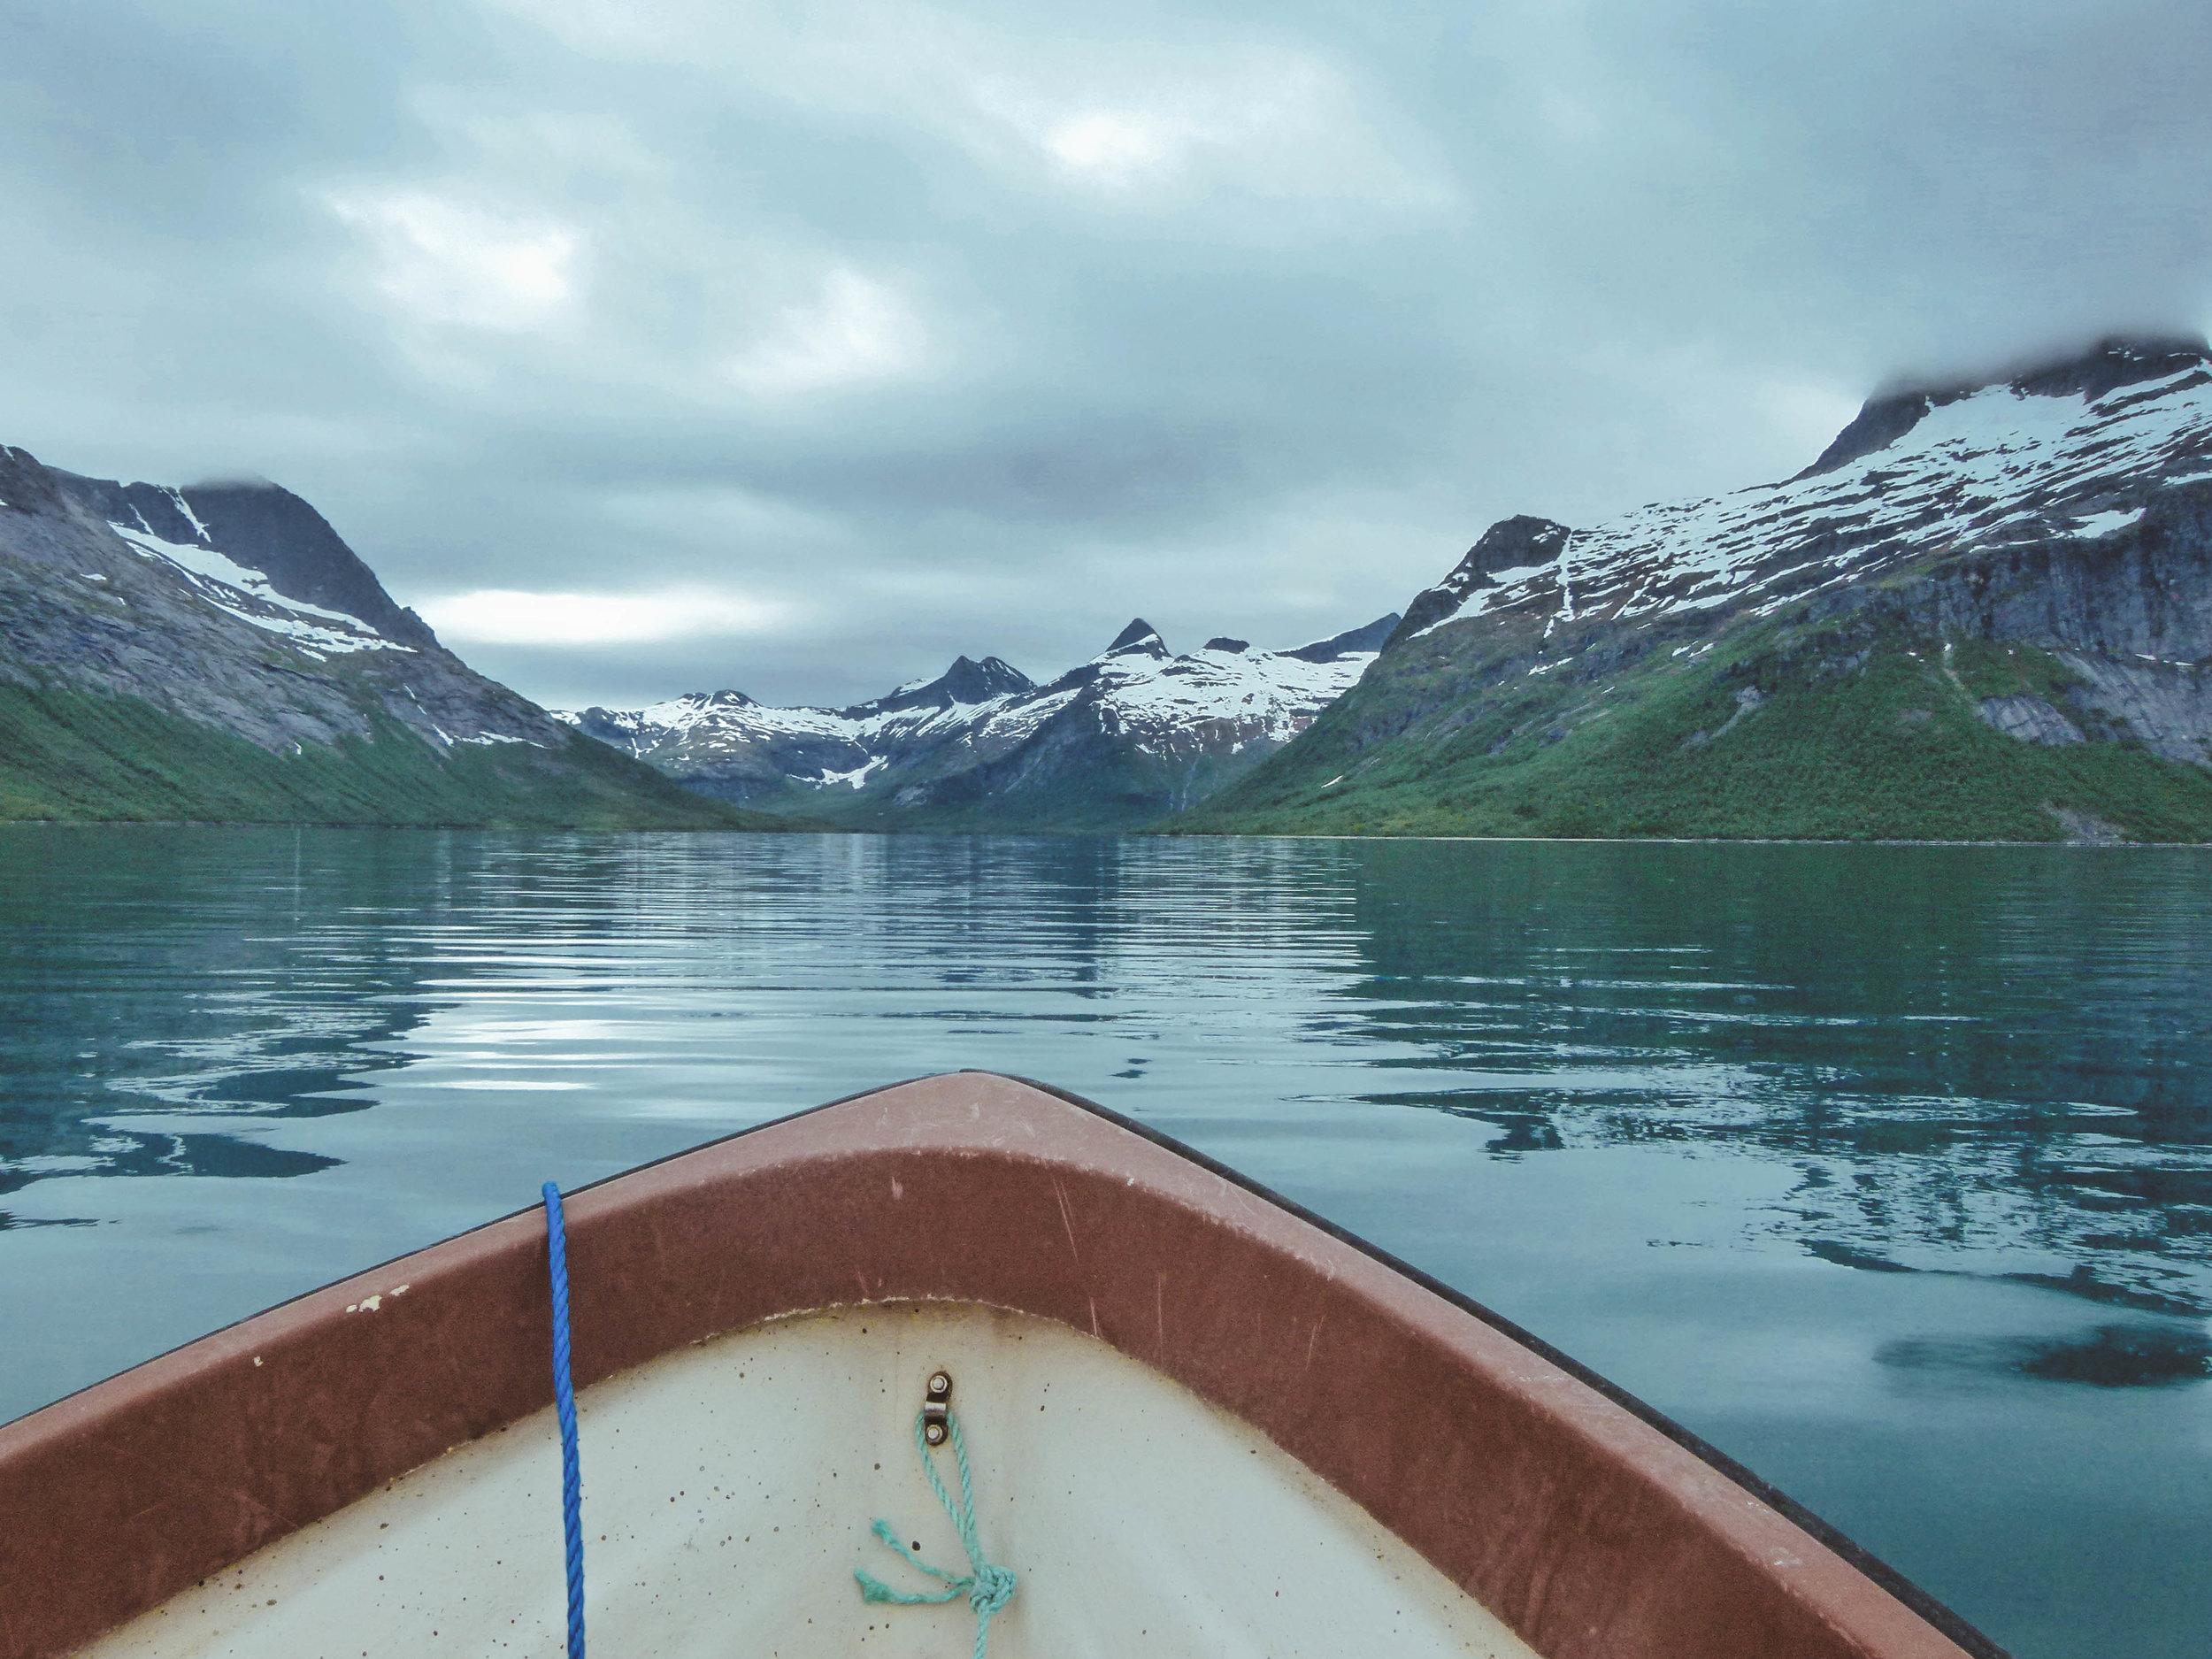 Exploring Sjunkfjord in Sjunkhatten National Park